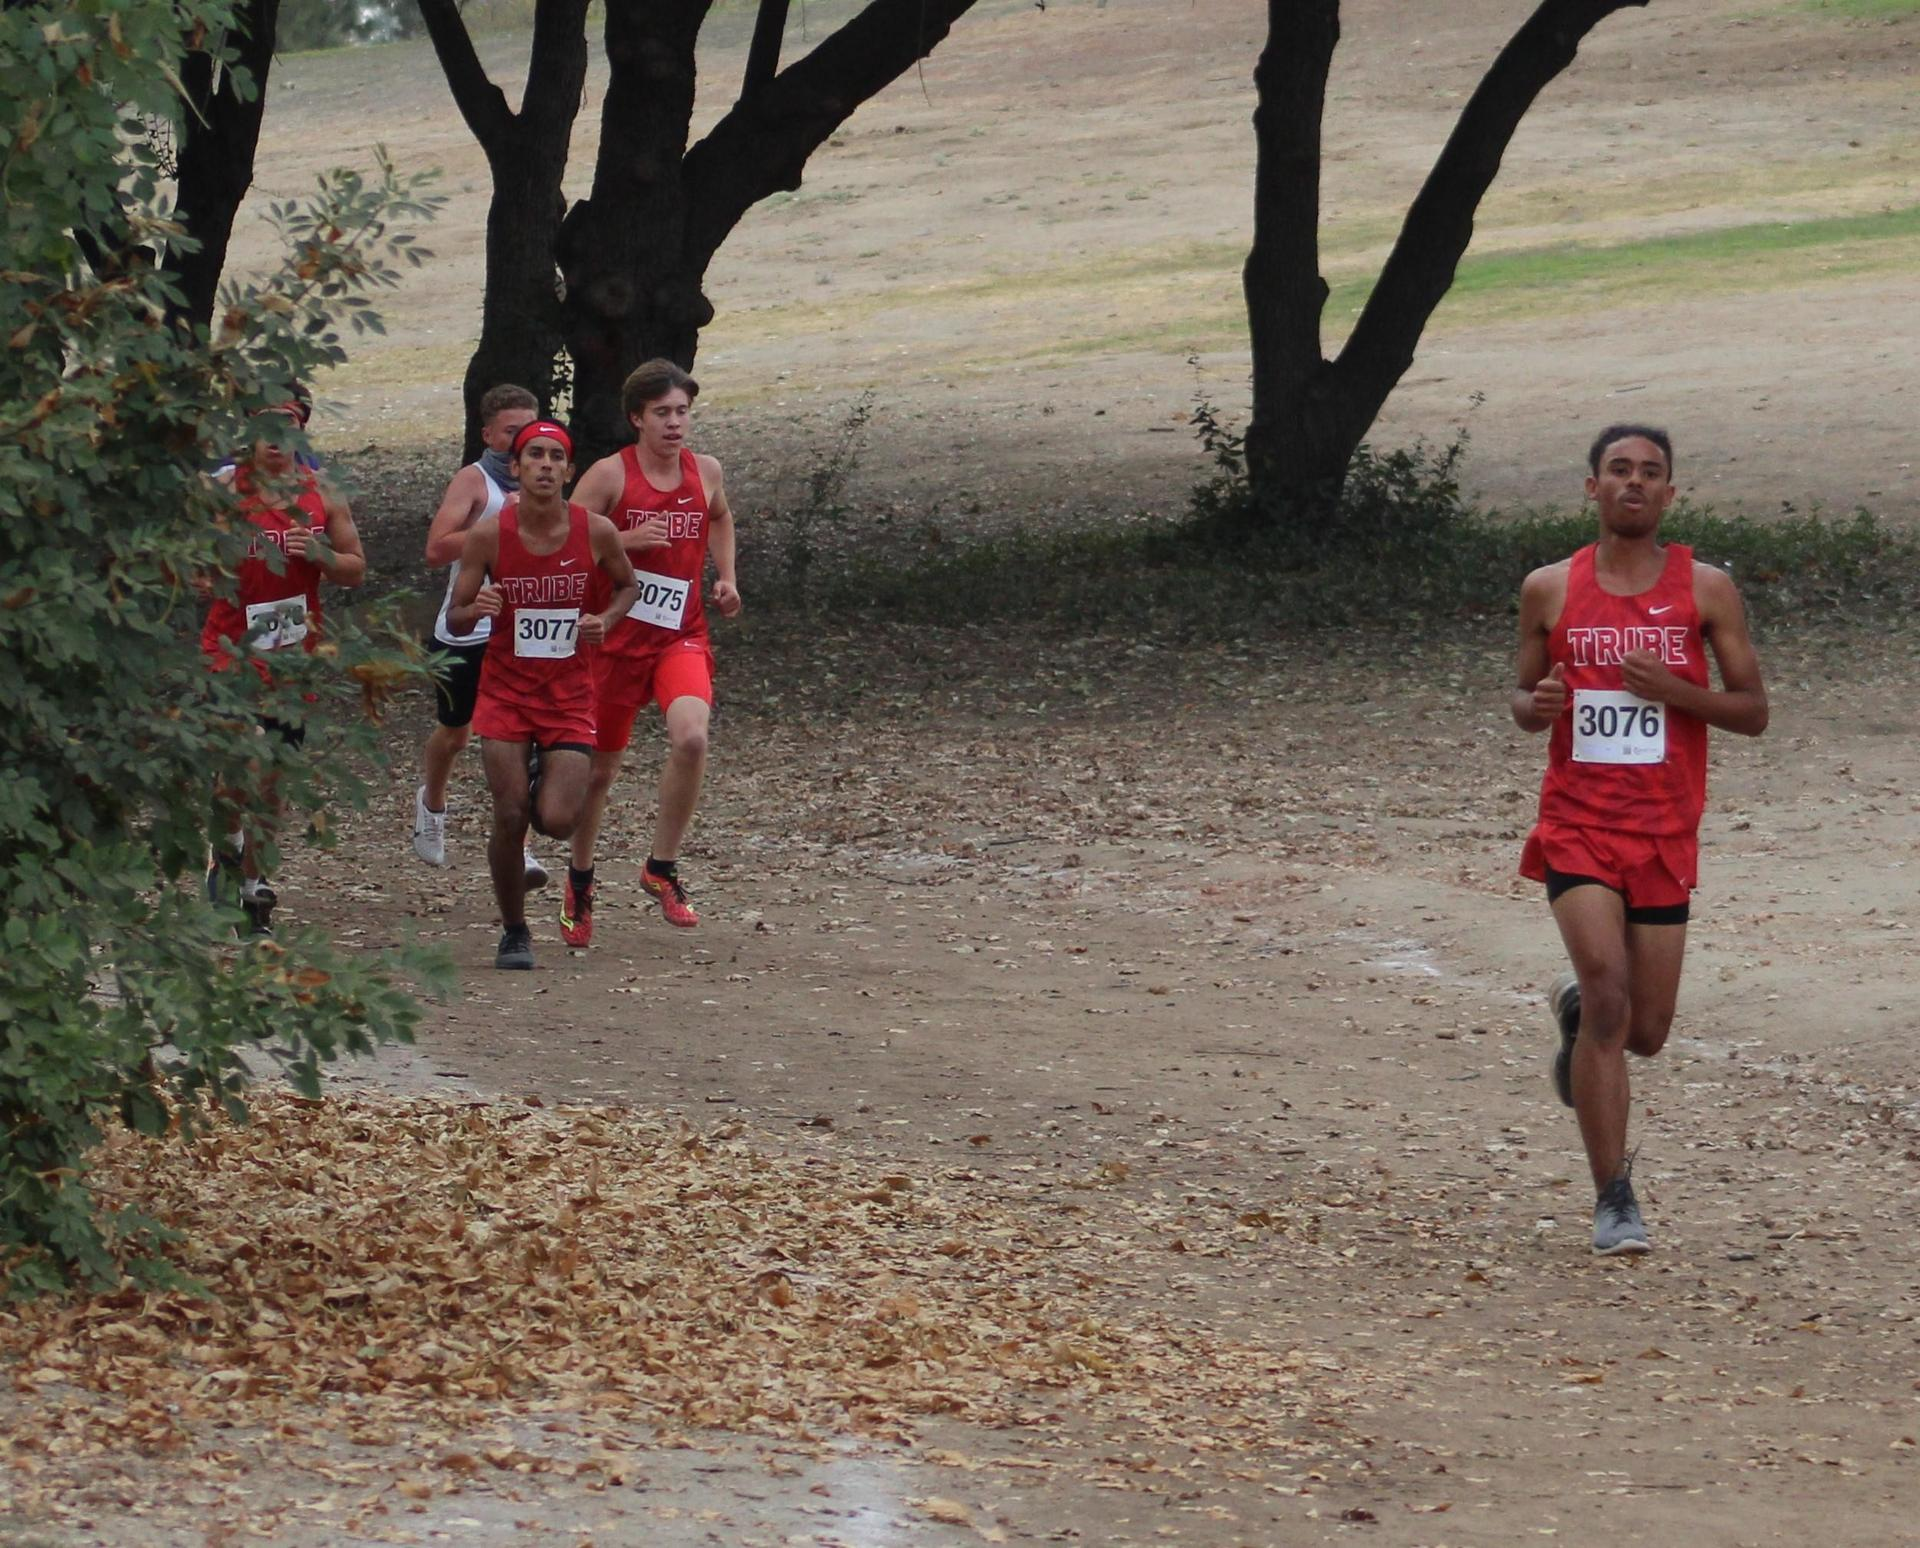 Lawerence Luna, Nicholas Martinez, and Nick Upton racing at woodward park